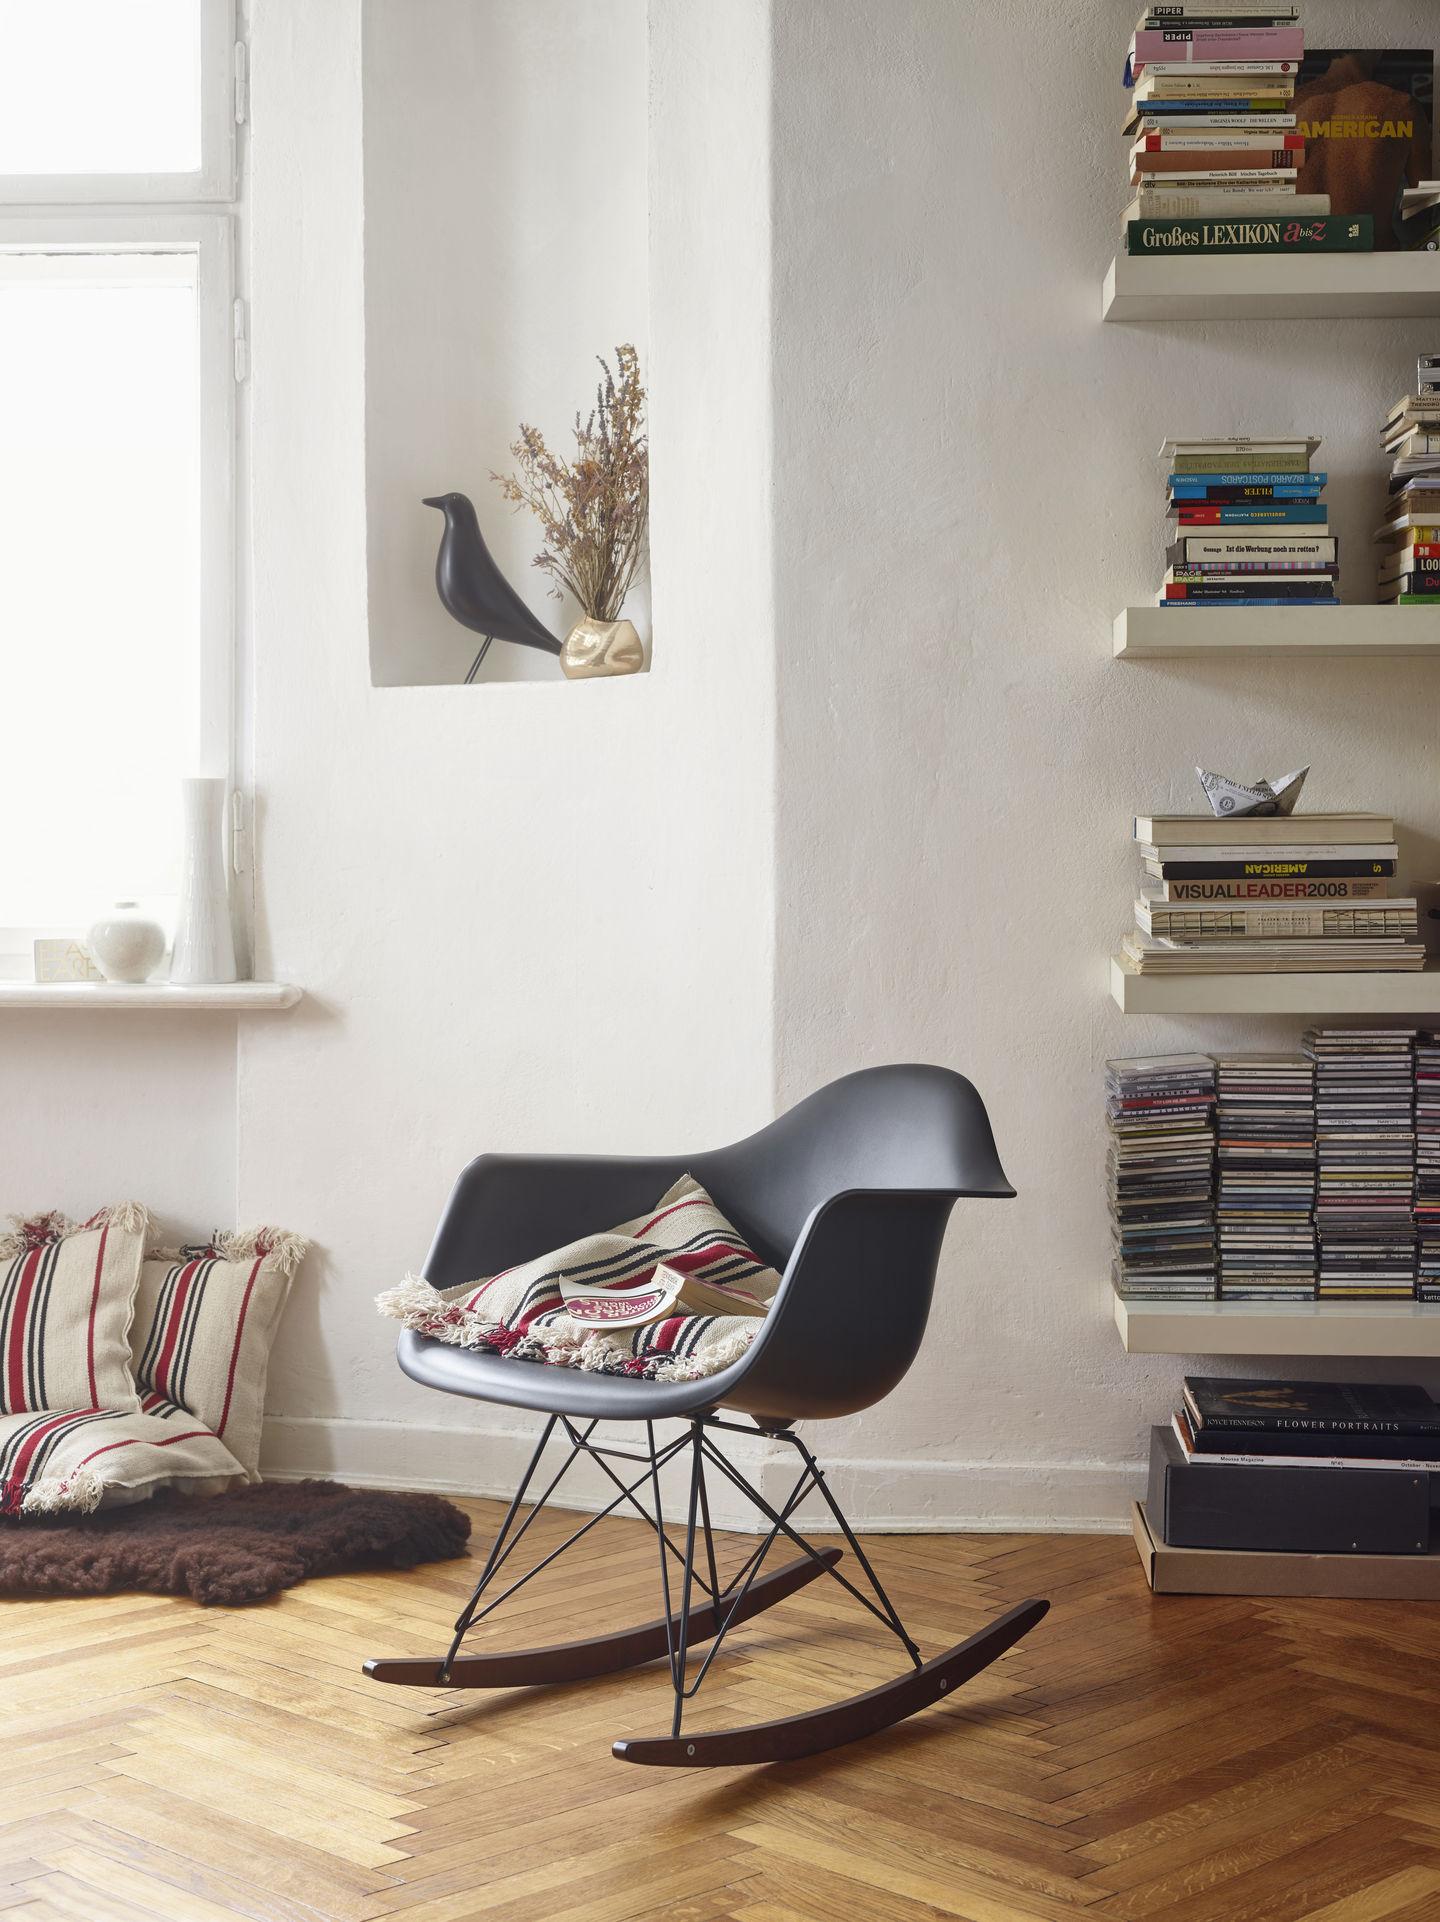 1097277-eames-plastic-armchair-rar-v-fullbleed-1440x